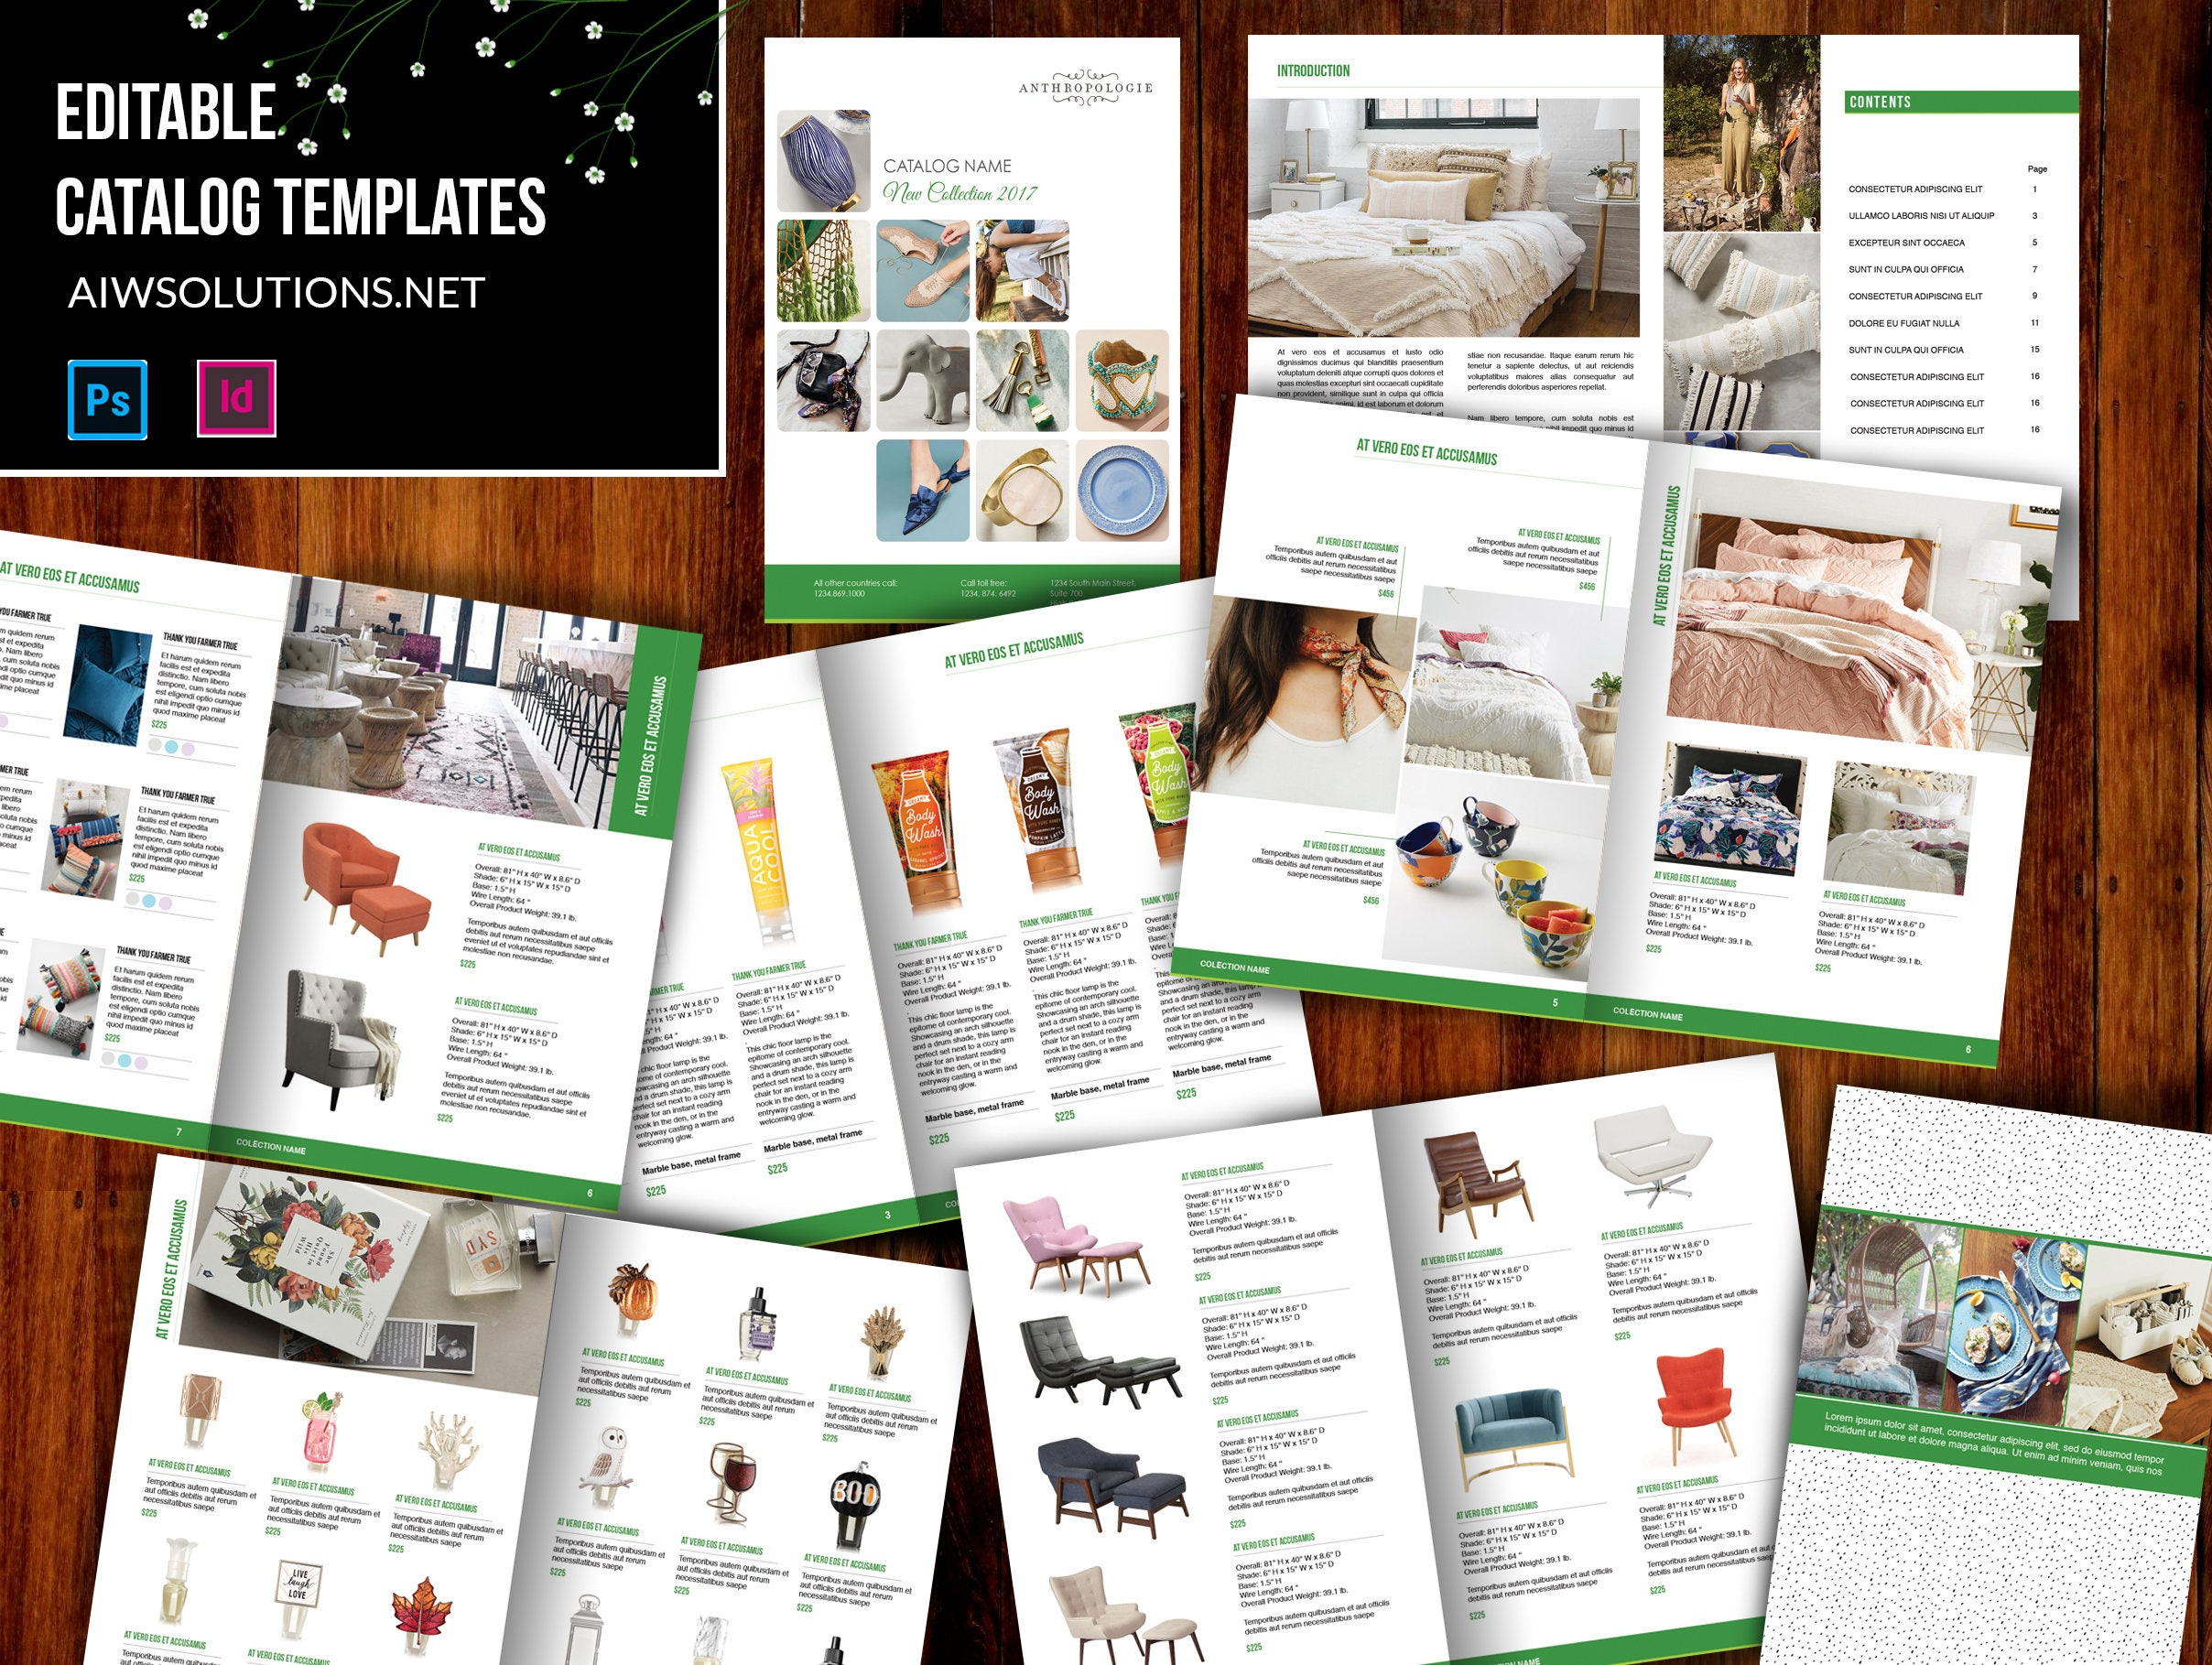 Produkt-Katalog Broschüre Kataloge Katalogvorlage INDESIGN